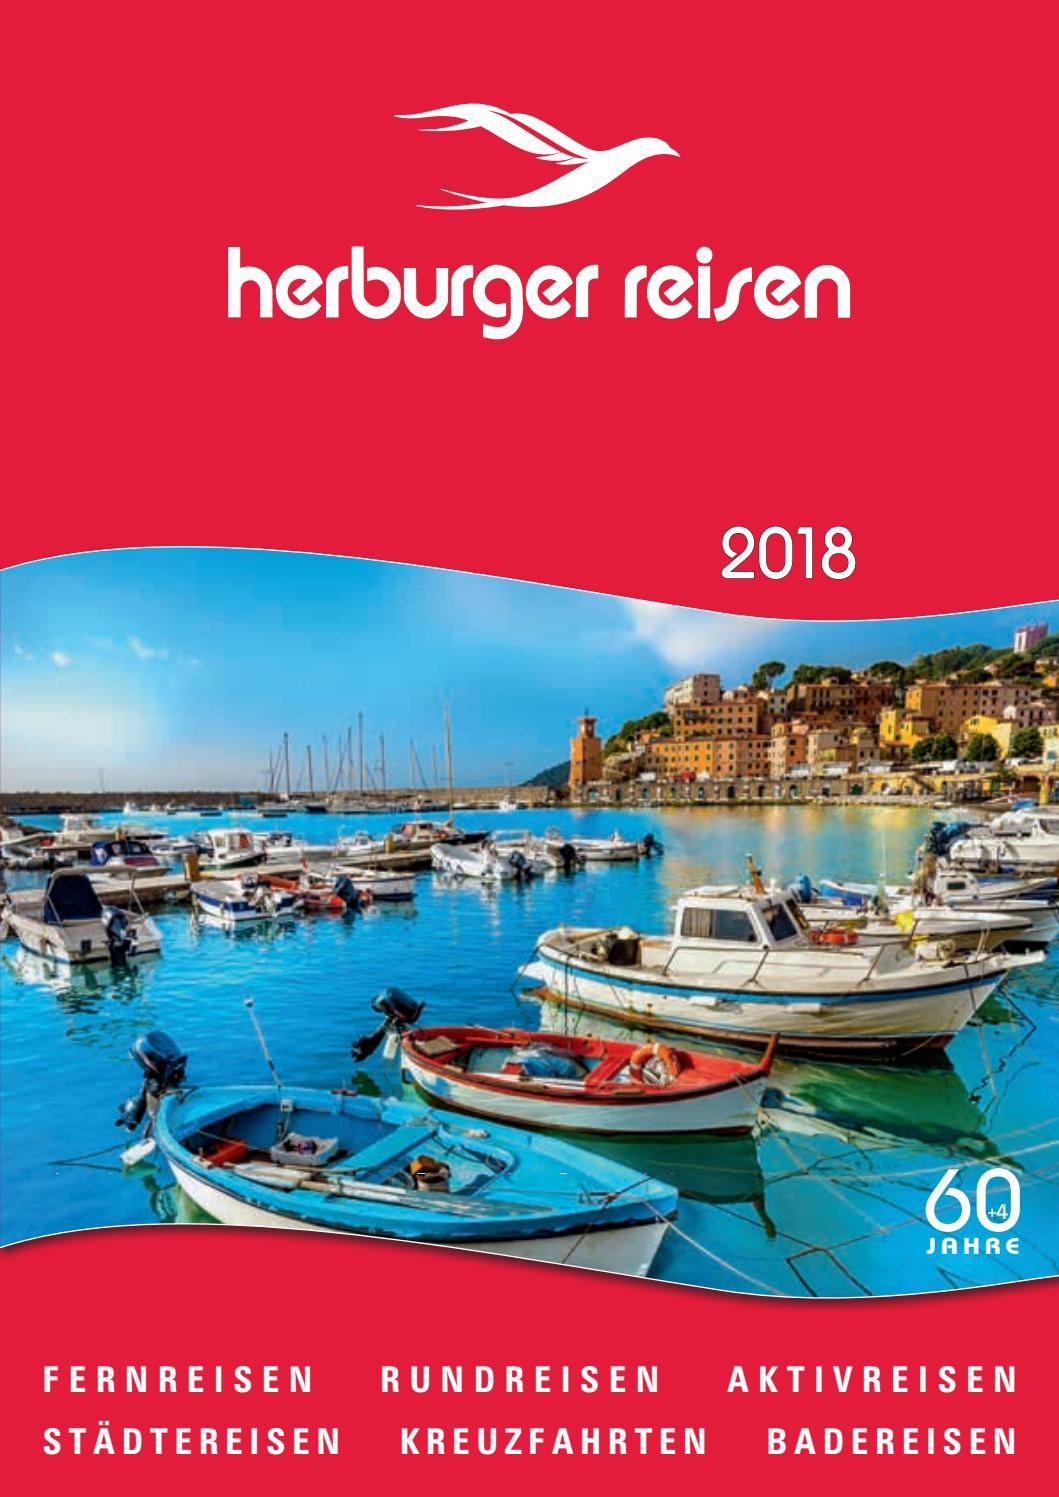 Reisekatalog 2018 gesamt1 by HerburgerReisen - issuu